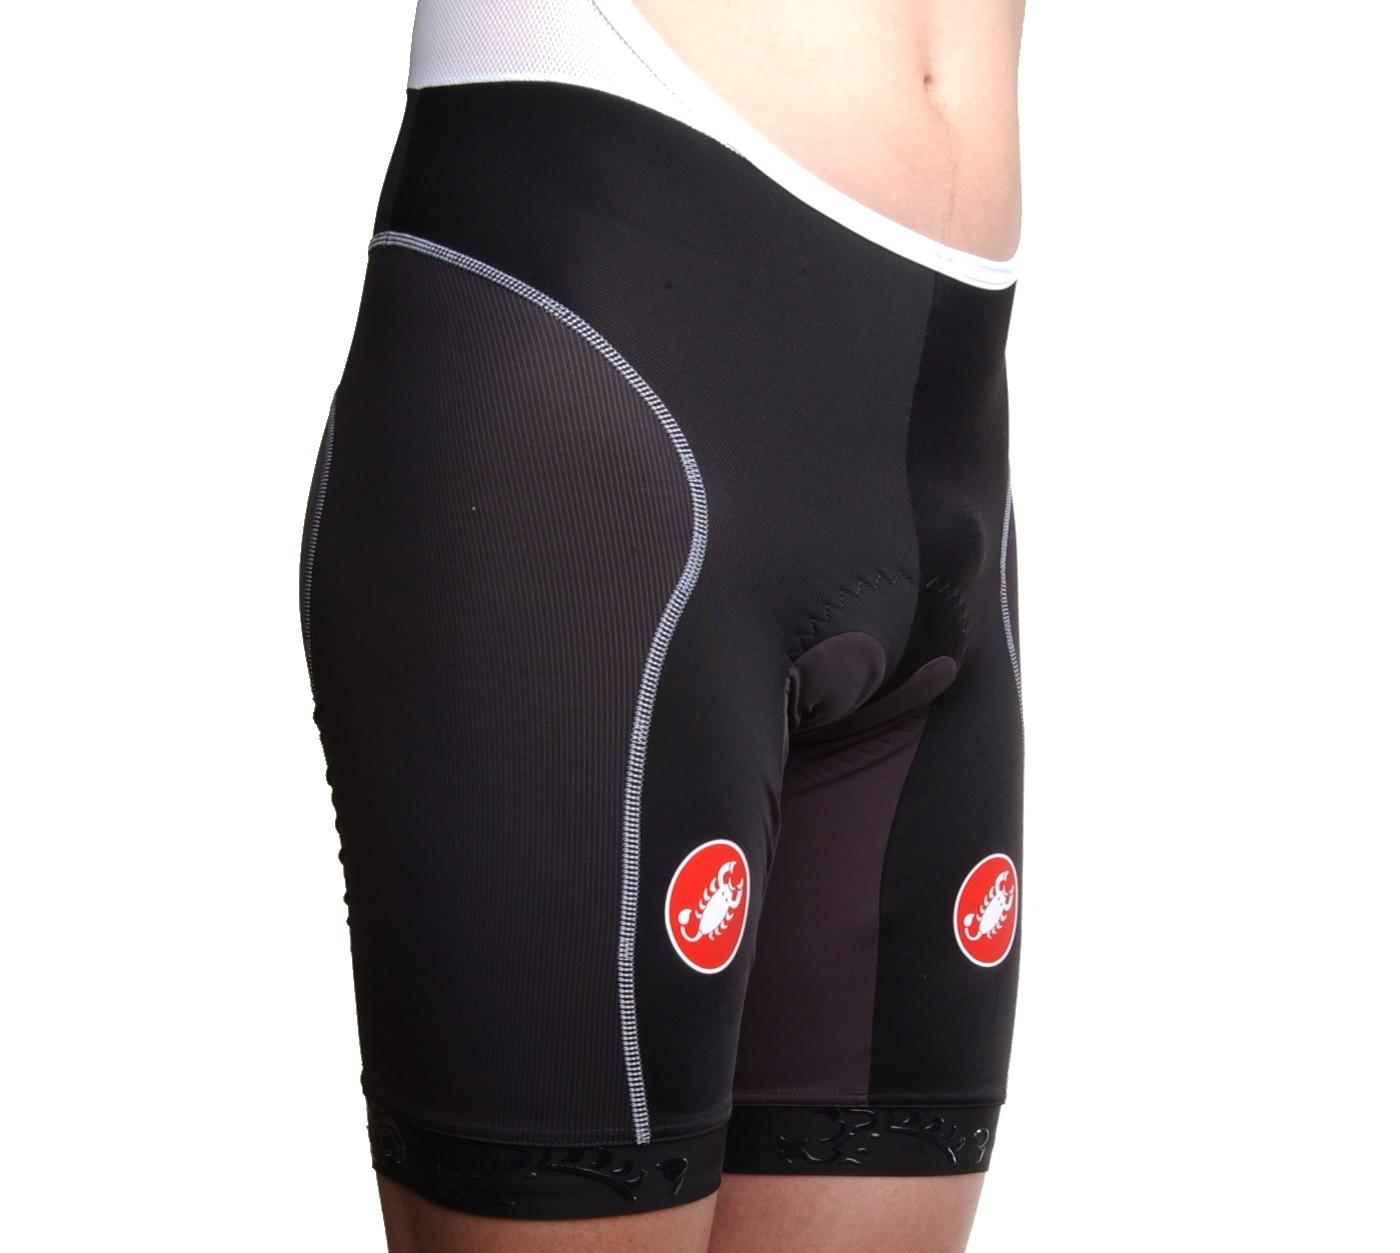 Castelli Free bib shorts are spendy but super-comfortable